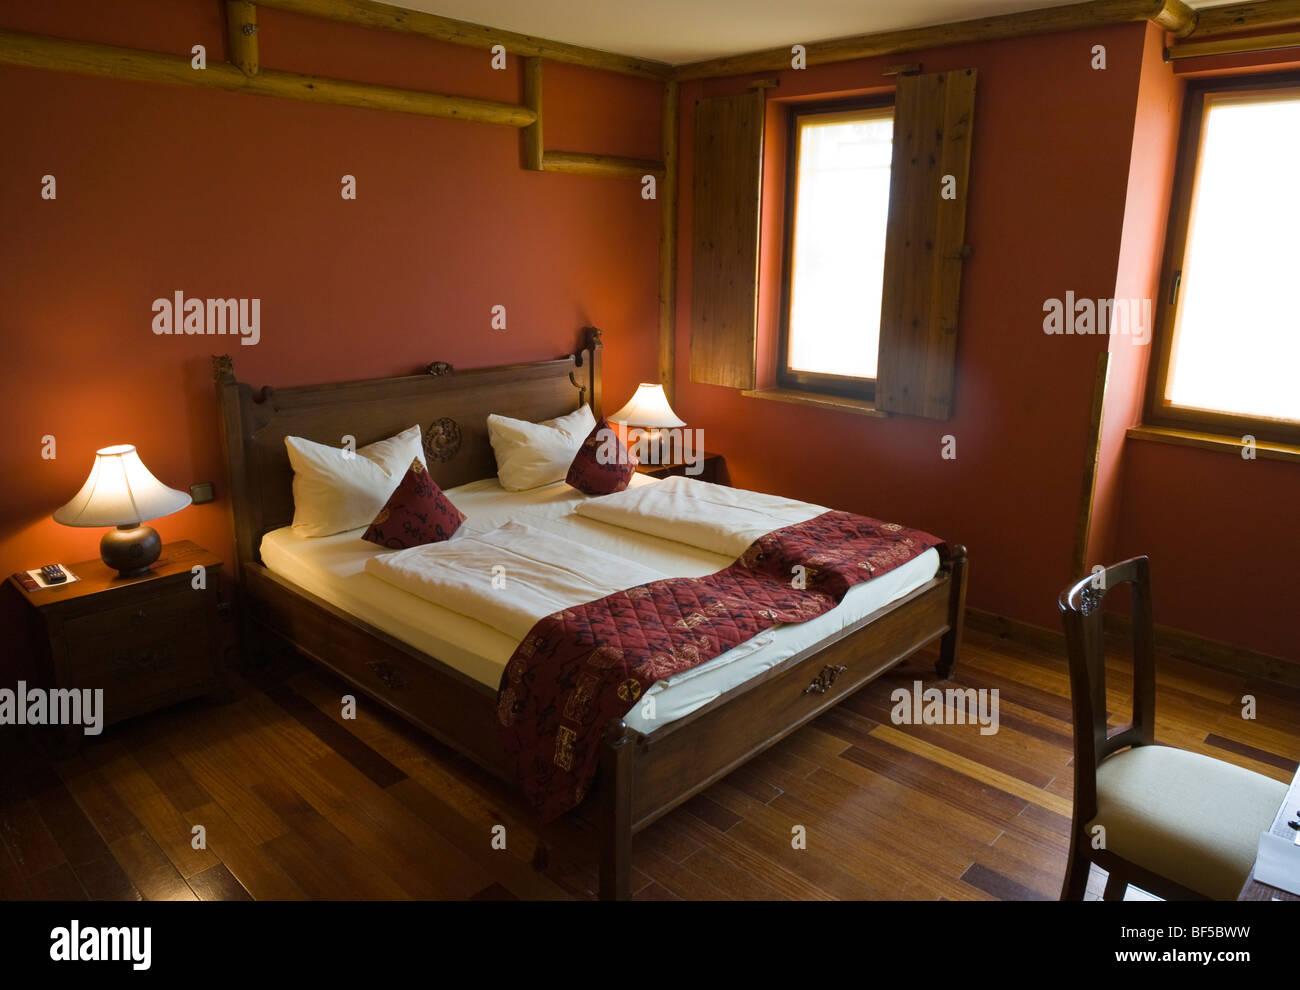 Phantasialand Hotel LING BAO, Bruehl, Nordrhein-Westfalen, Germany, Europe Stock Photo